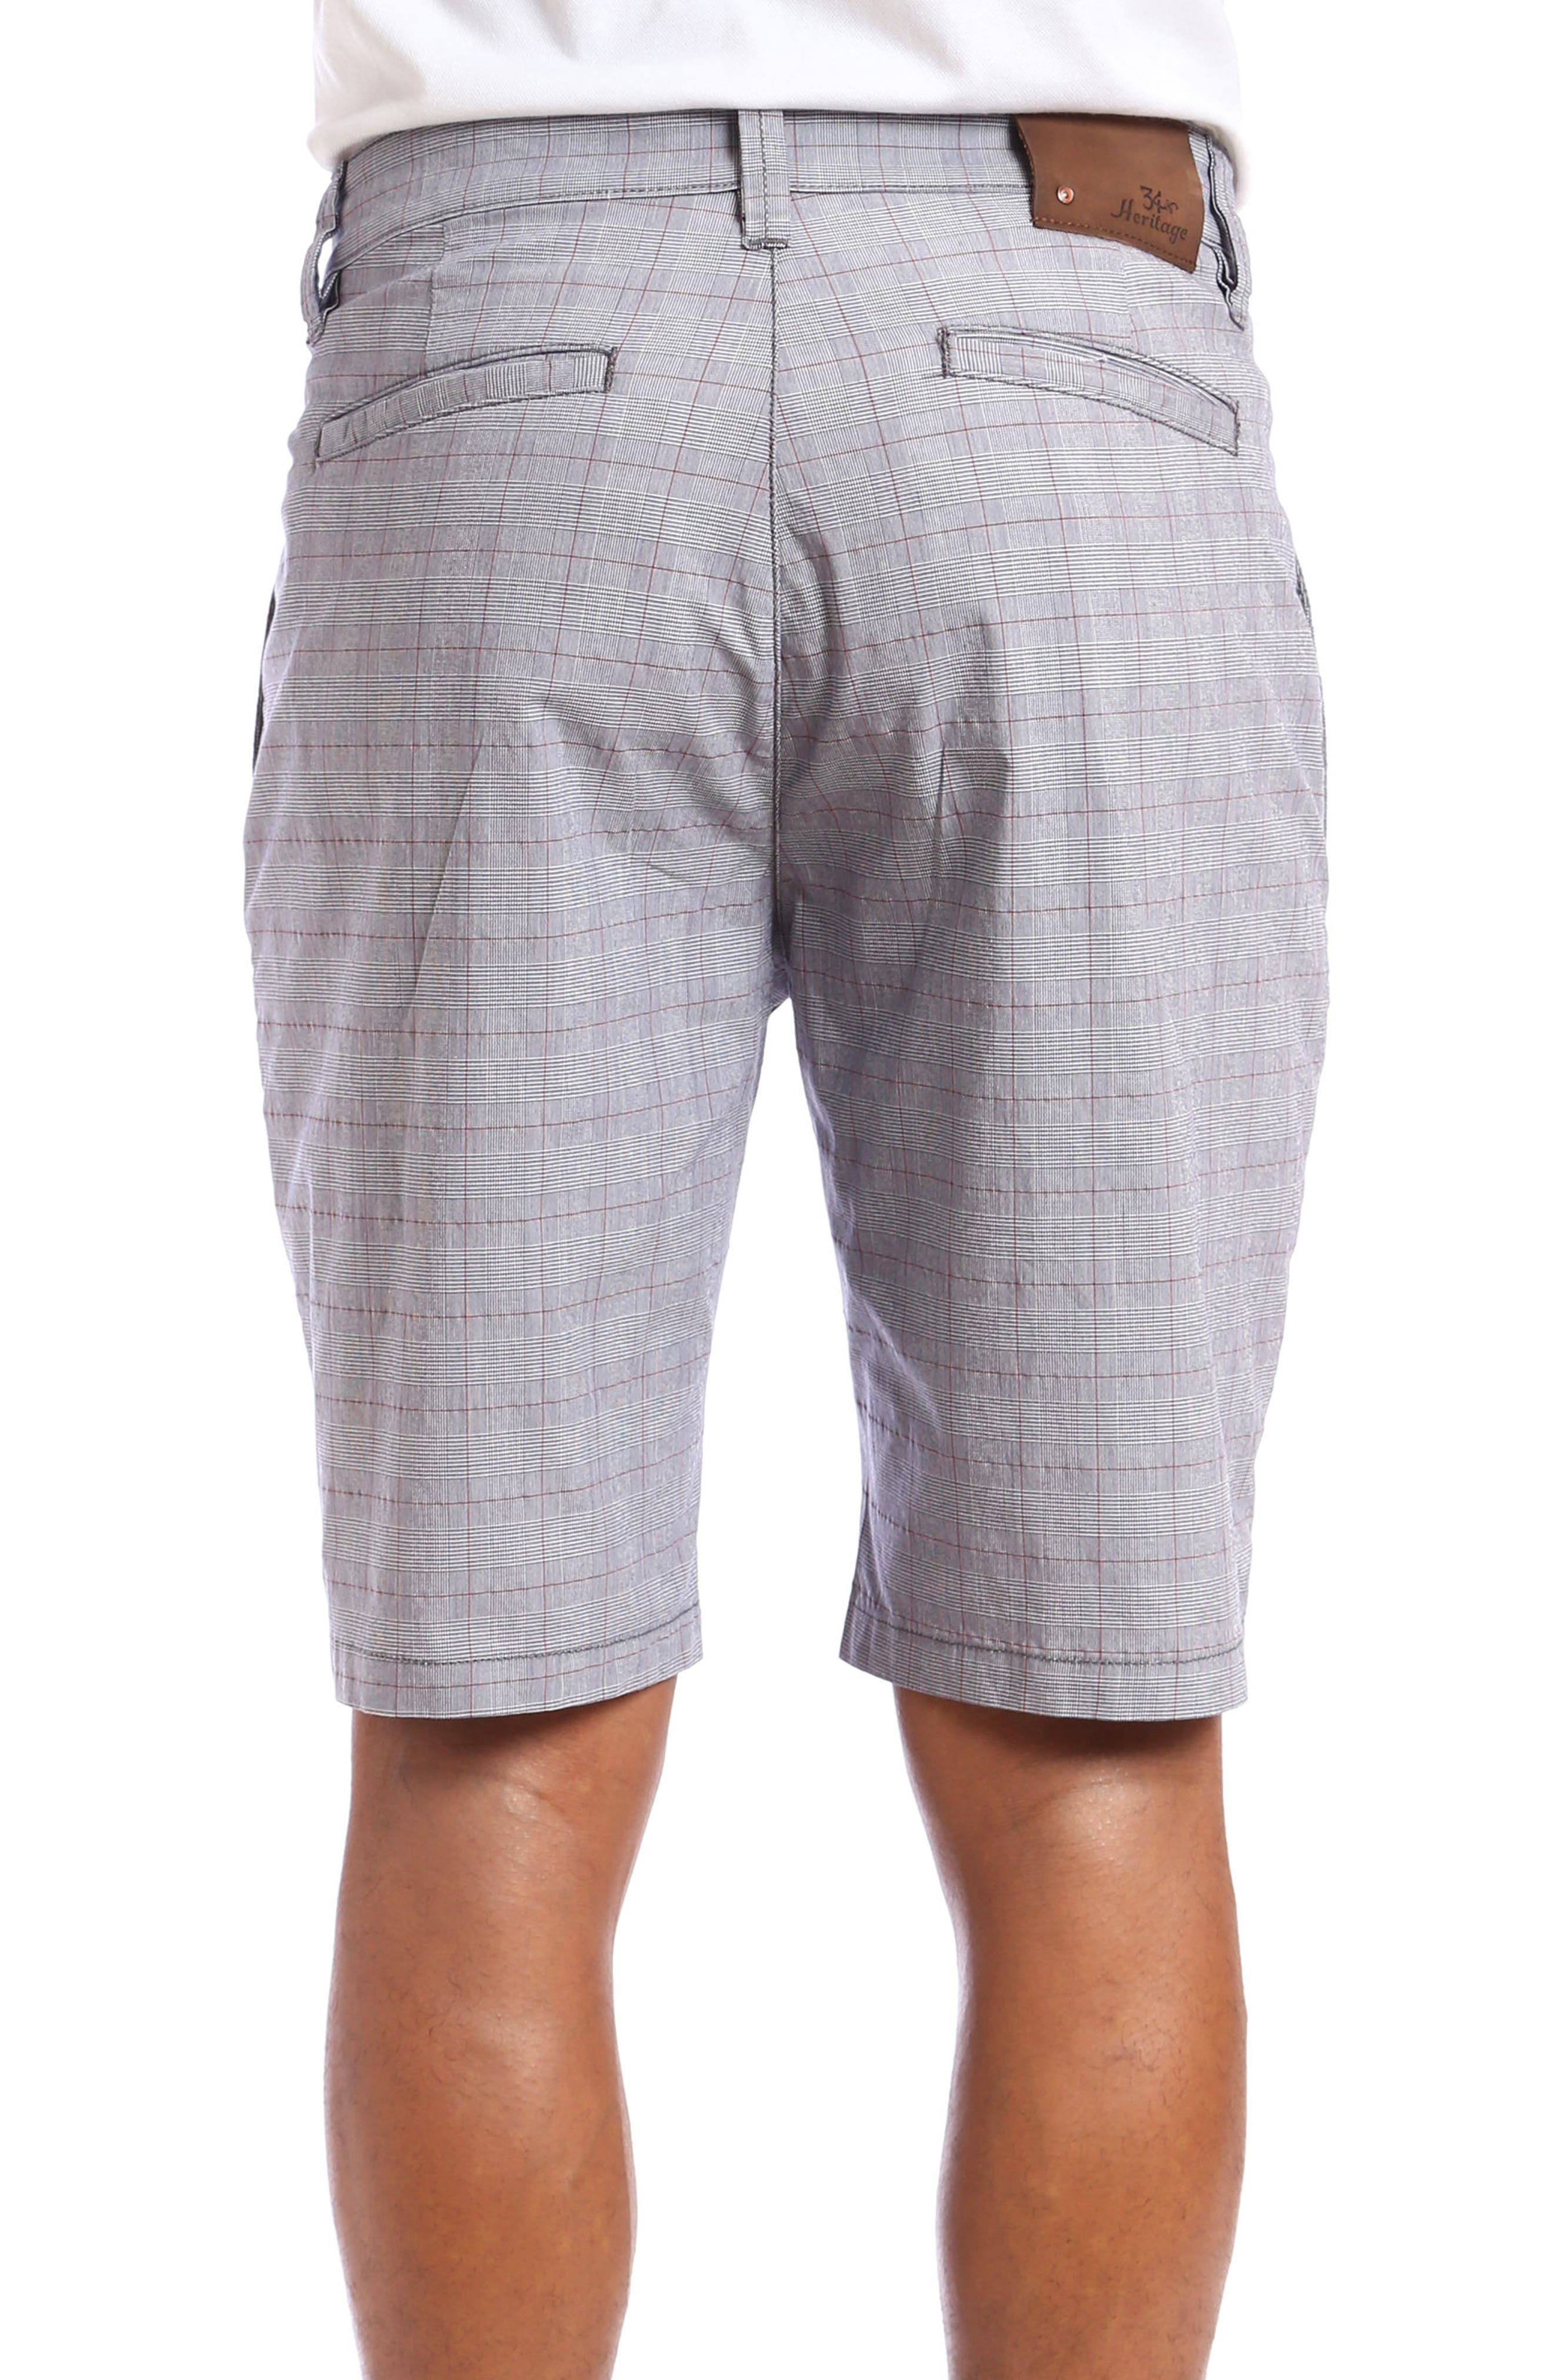 Nevada Twill Shorts,                             Alternate thumbnail 2, color,                             GREY PLAID